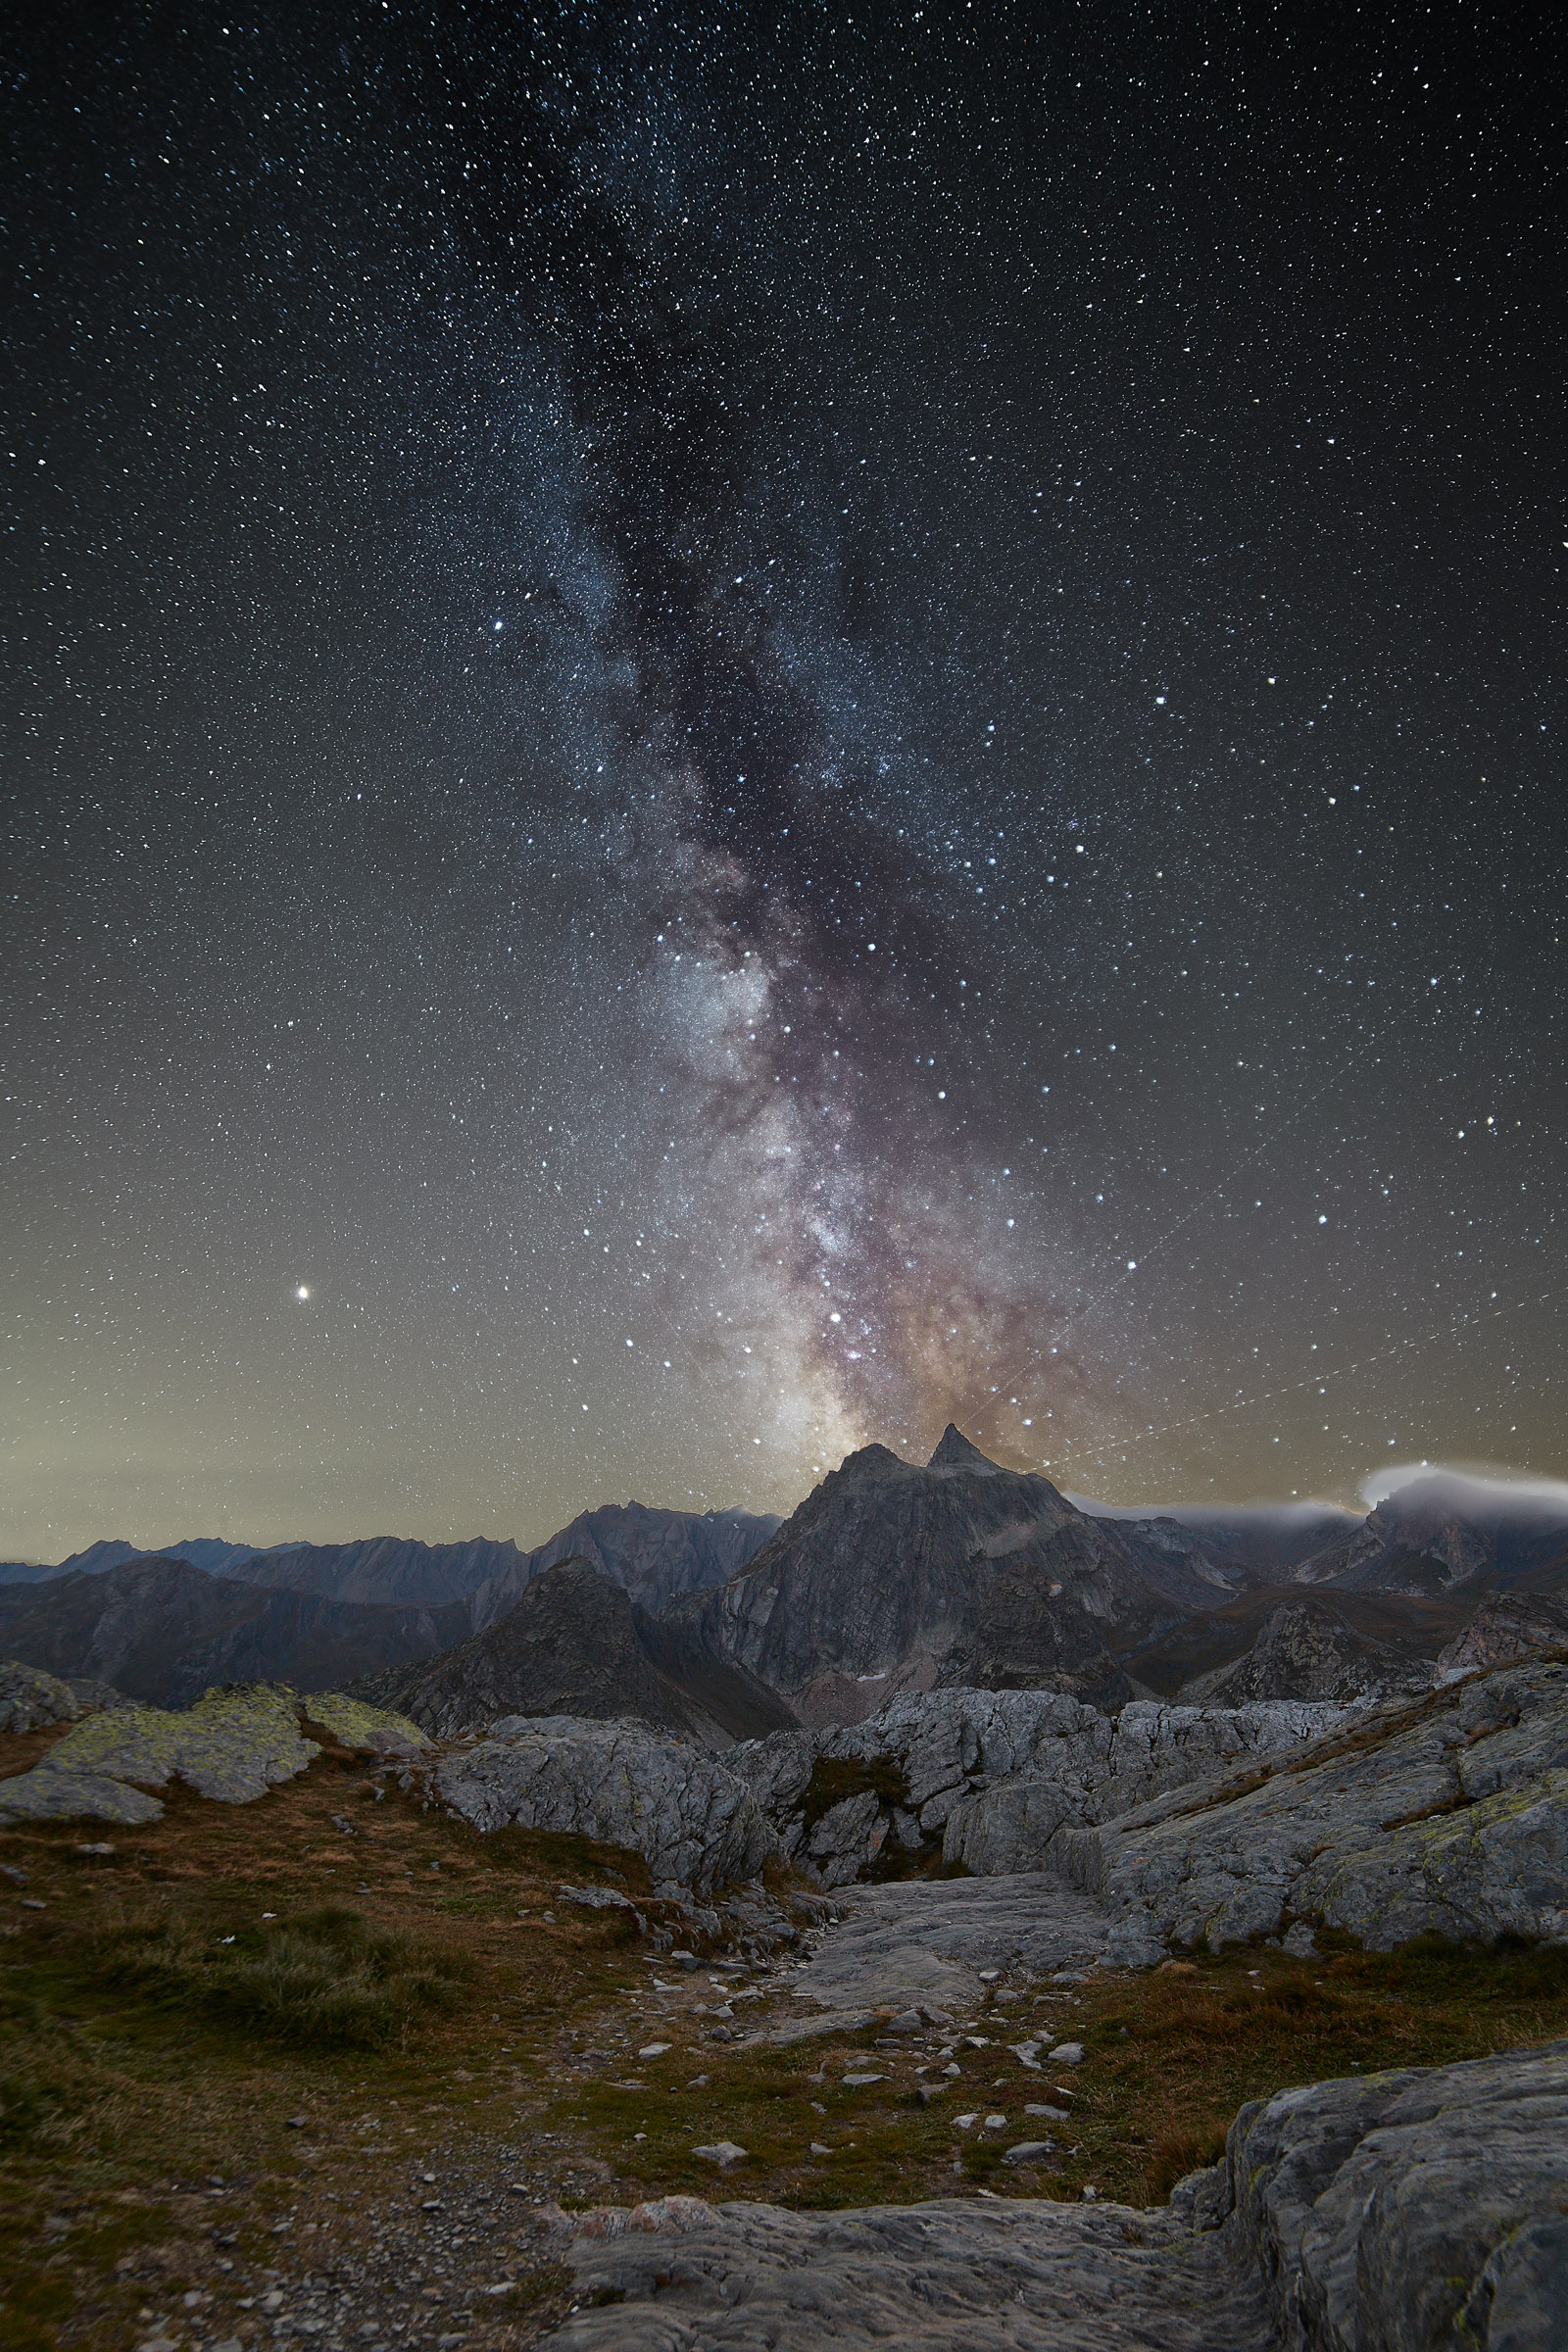 Milons of stars, millions of steps...